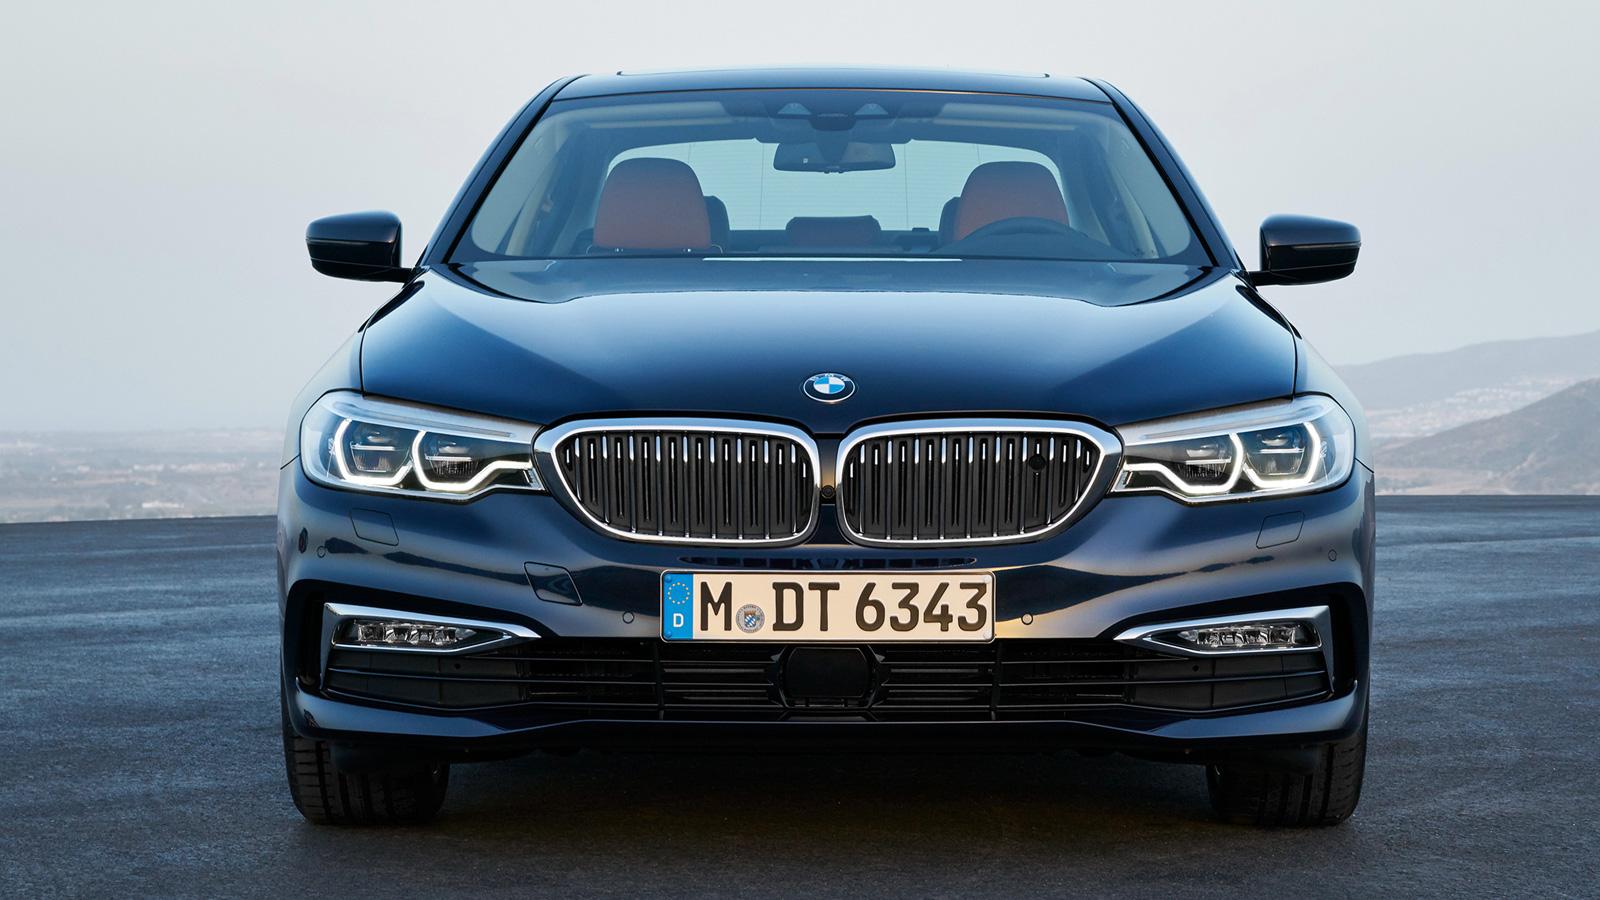 Картинки по запросу BMW 5 Series спереди